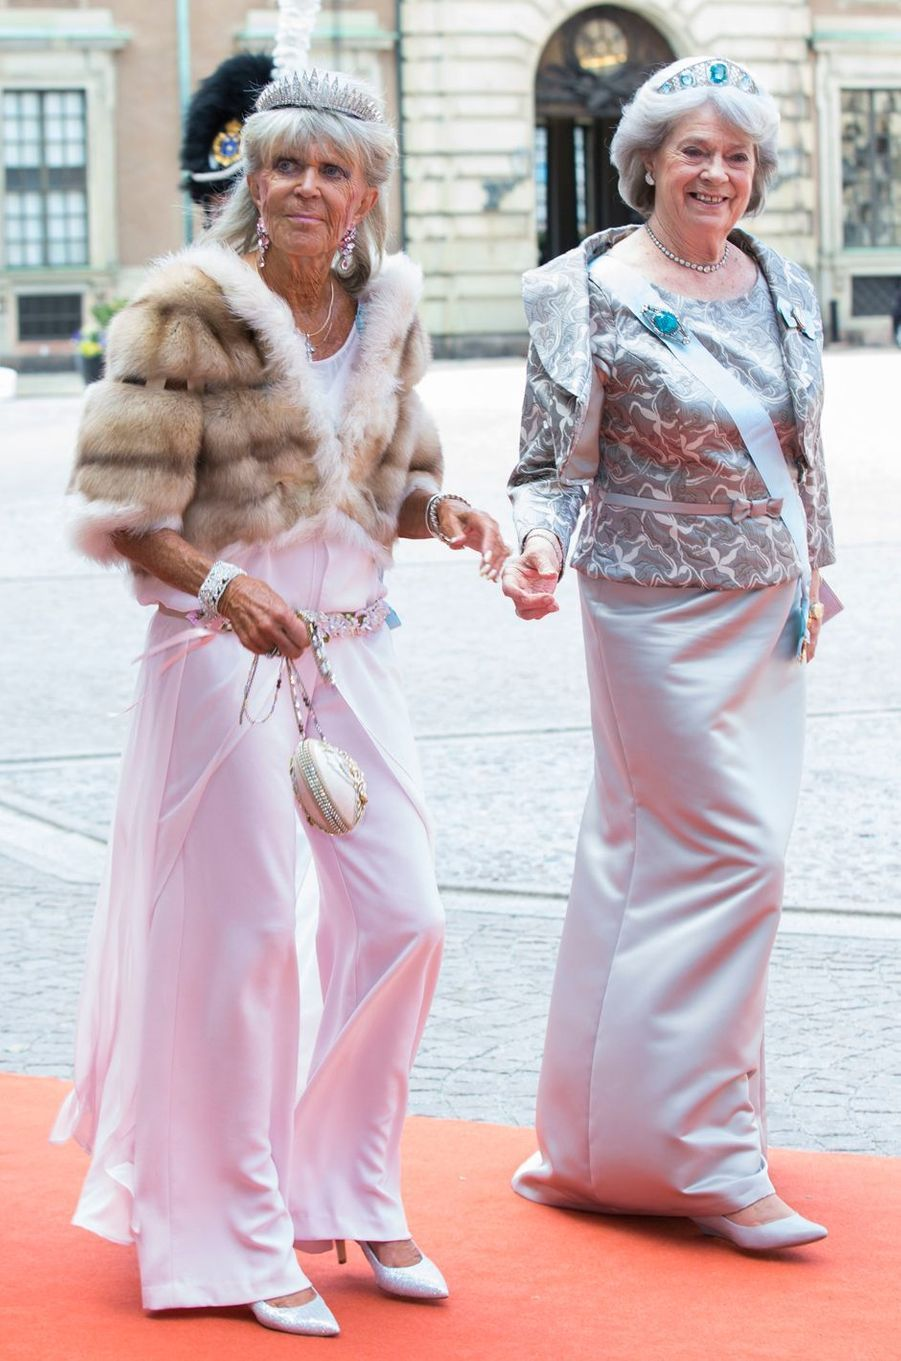 La princesse Birgitta de Suède avec sa soeur la princesse Margaretha, le 13 juin 2015